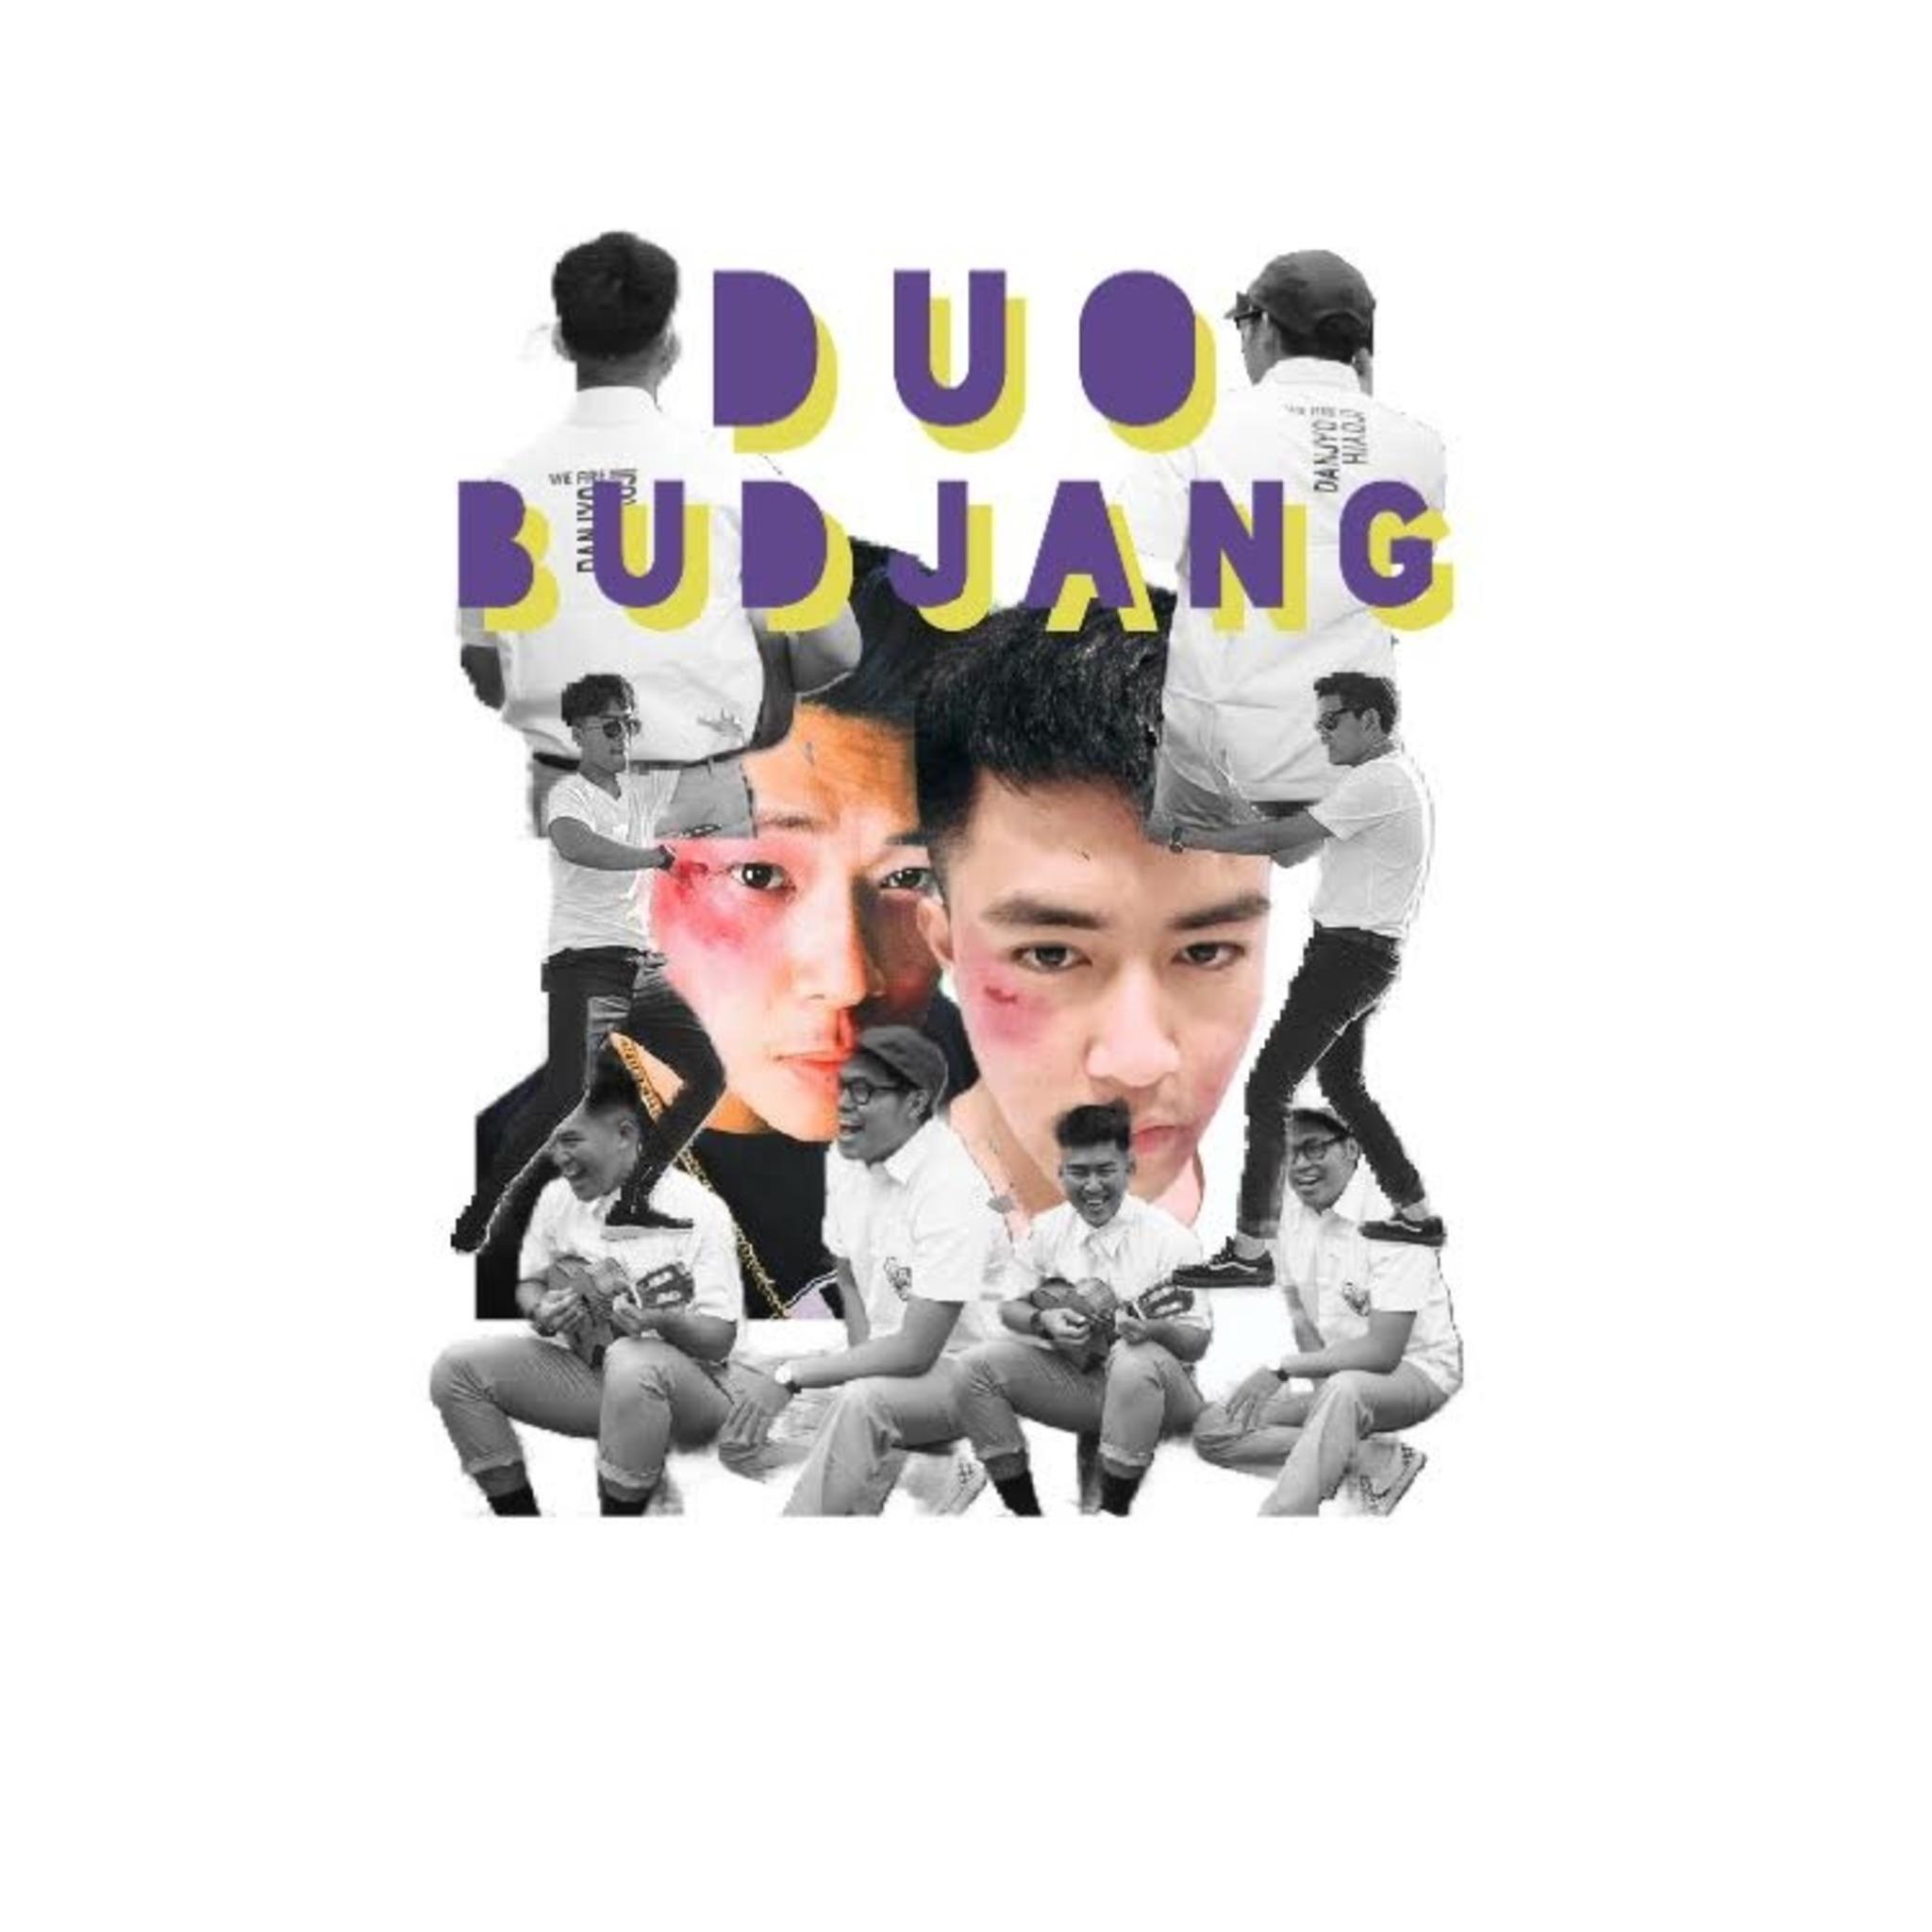 WHY DO WE NEED CONFIDENCE?   duobudjang podcast ep. 187